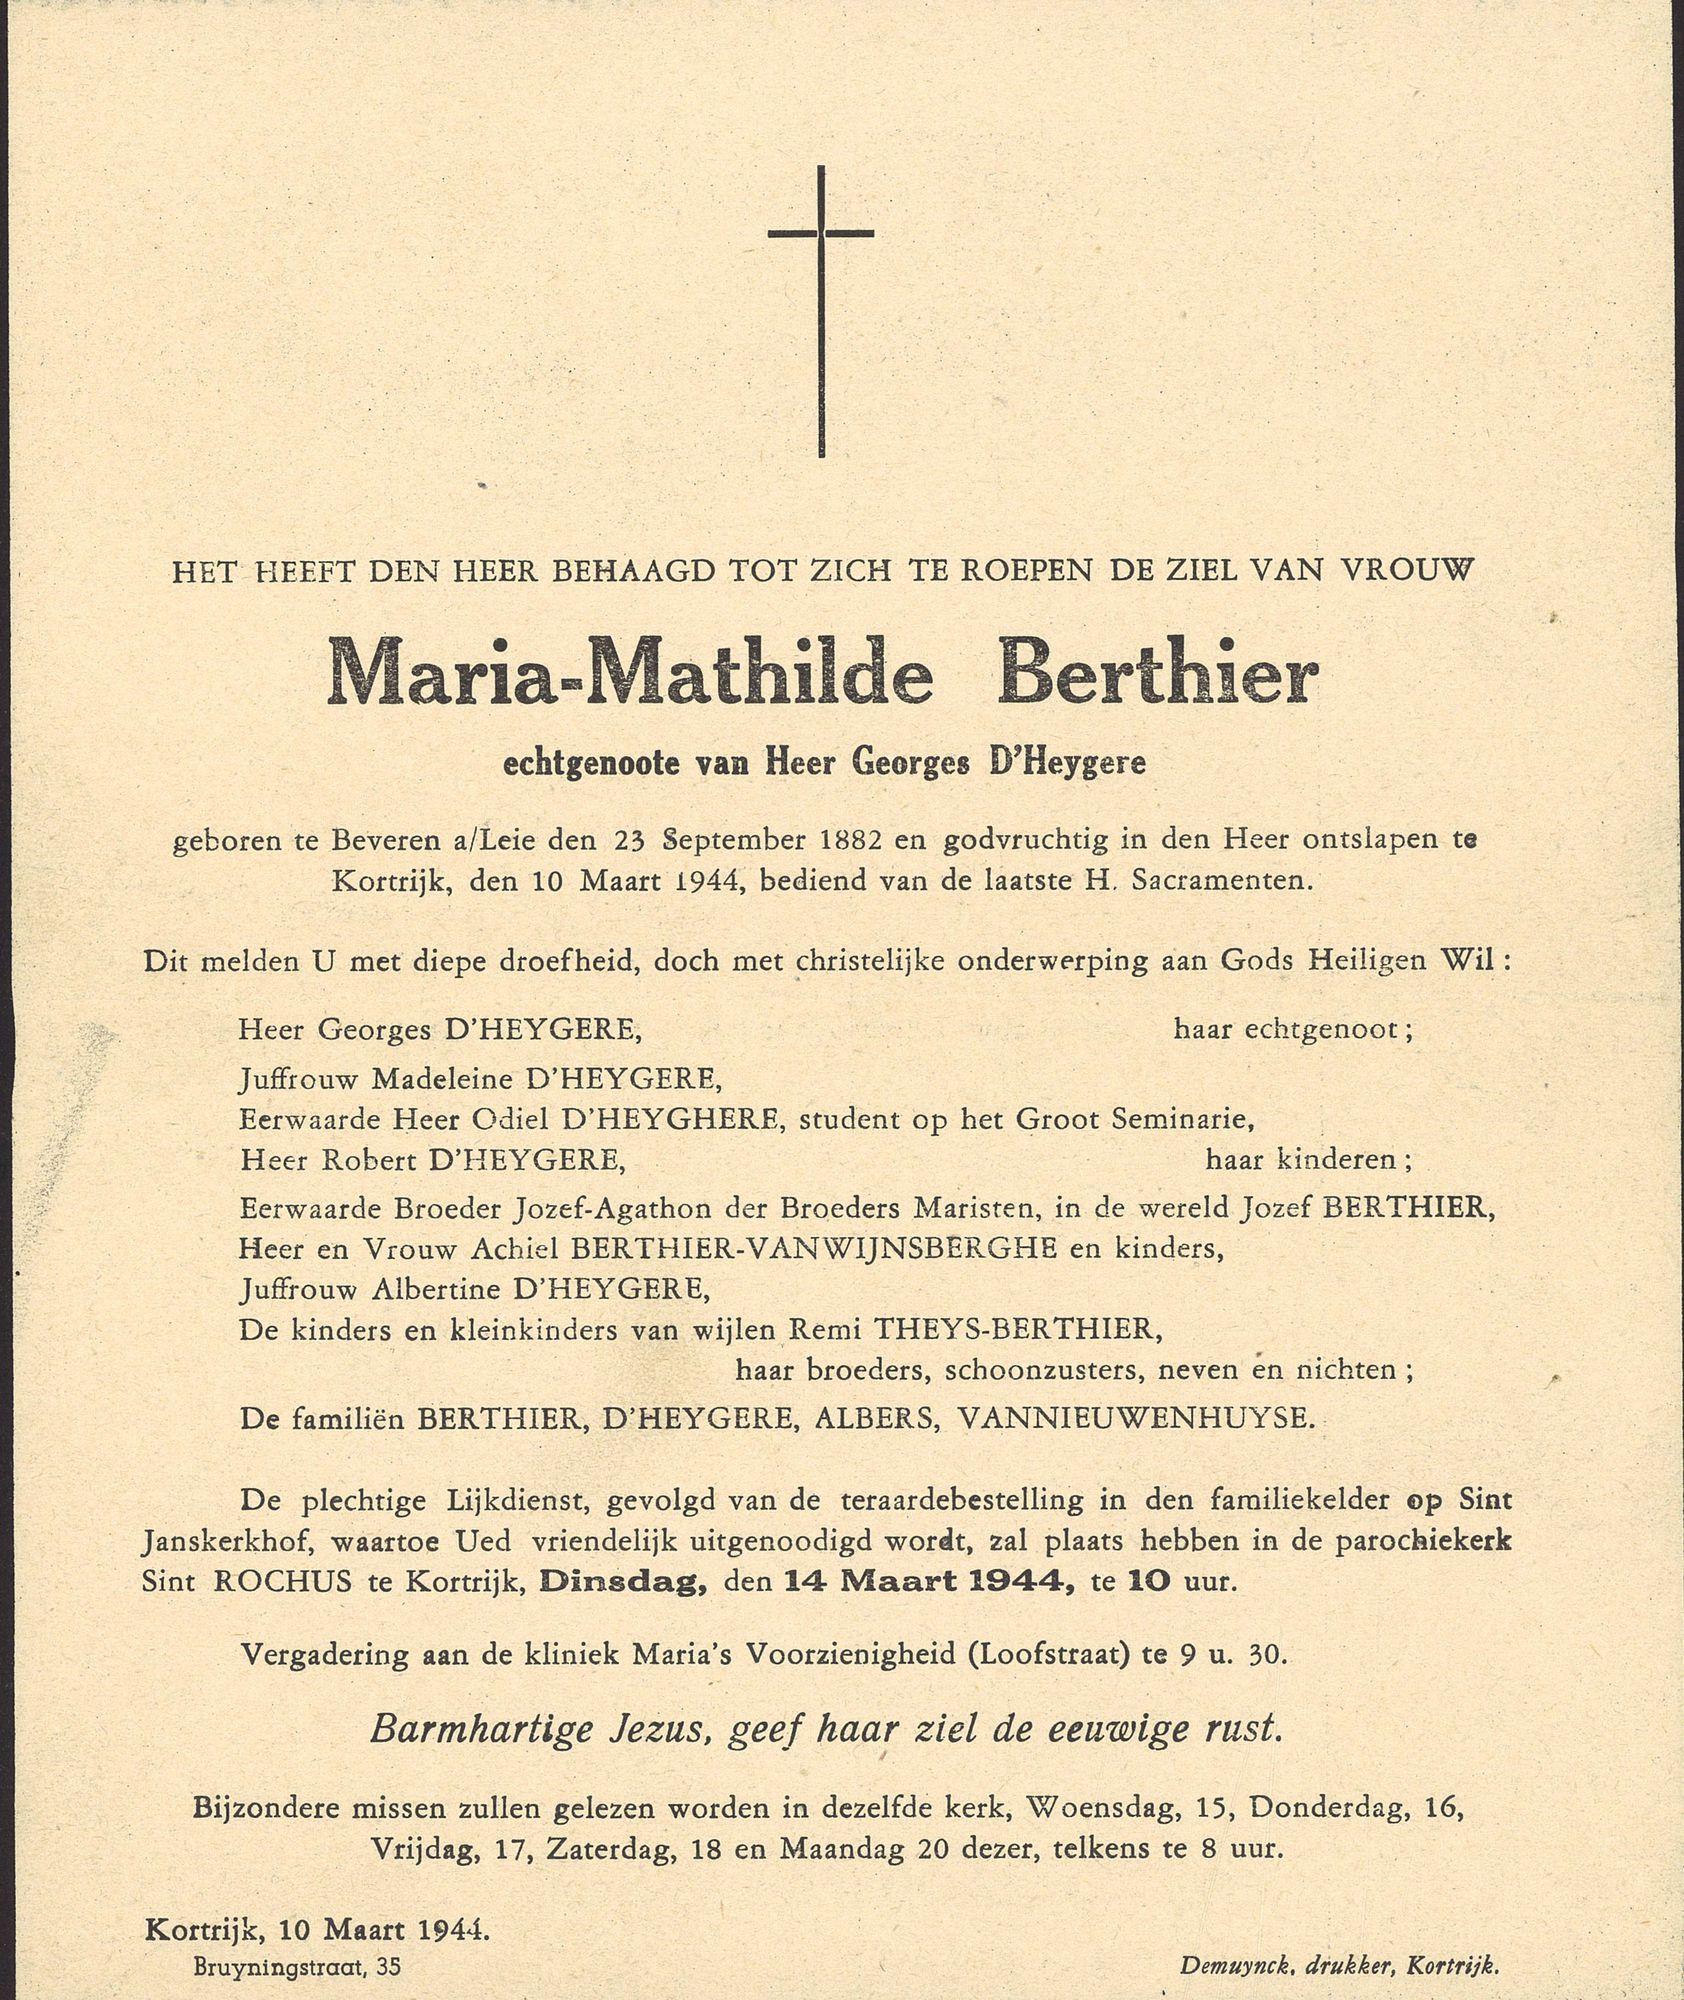 Maria-Mathilde Berthier